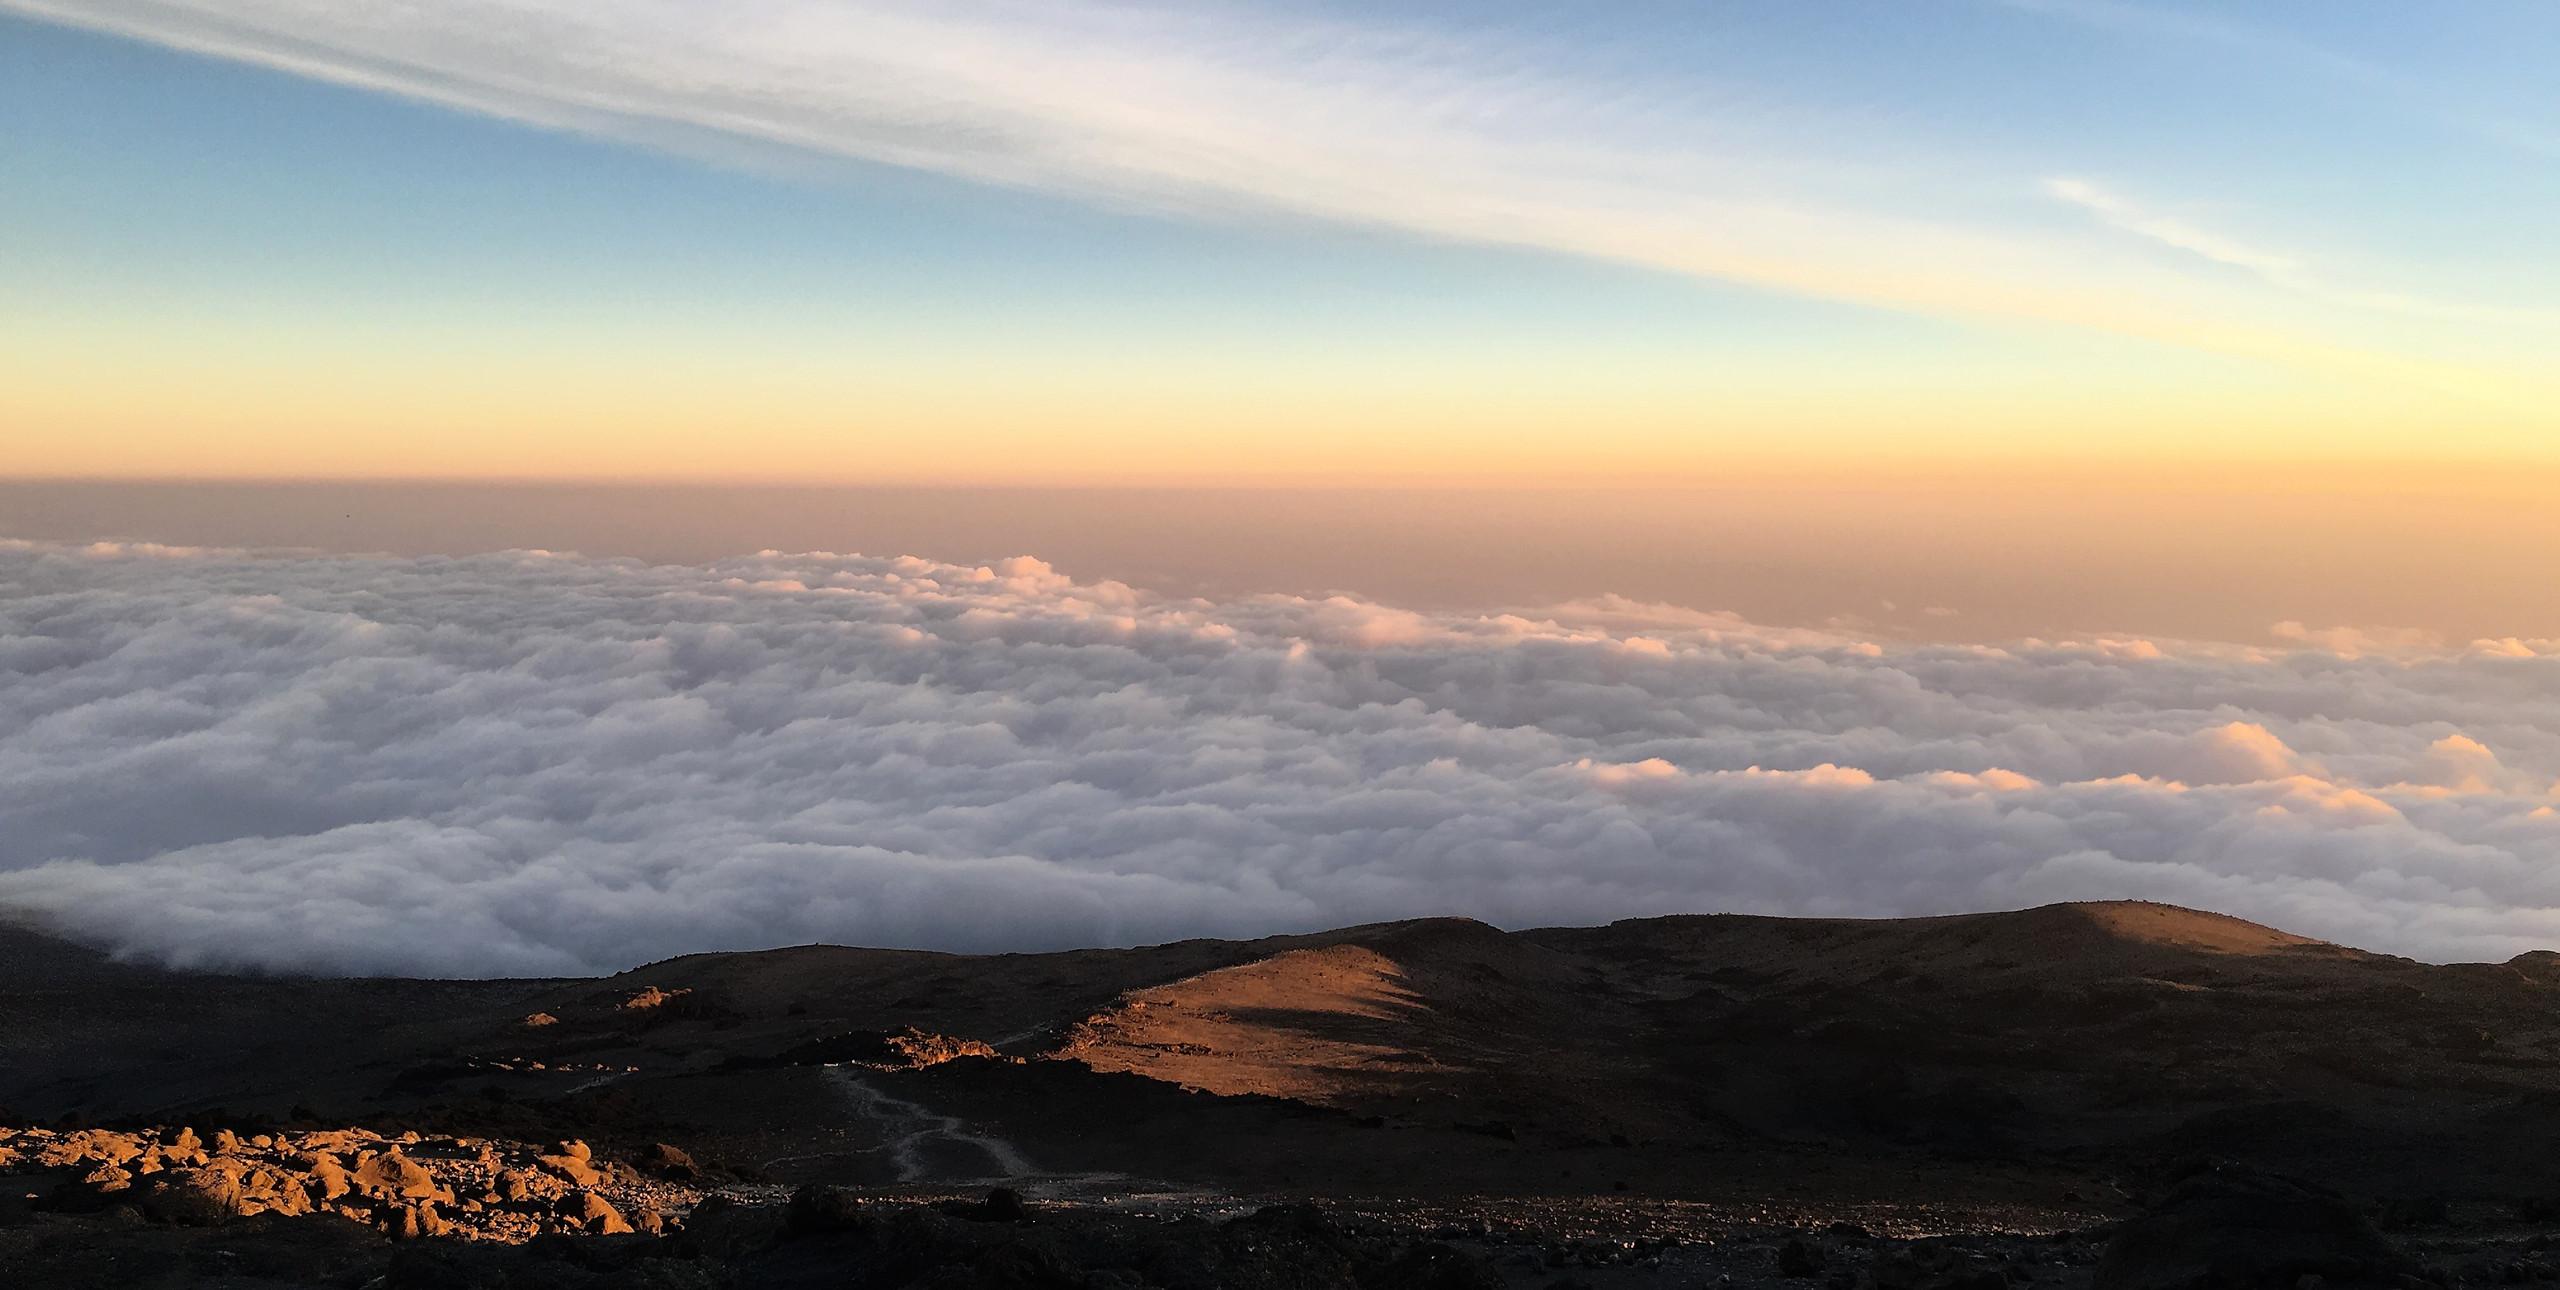 Закат на высоте 4640 м. — Килиманджаро